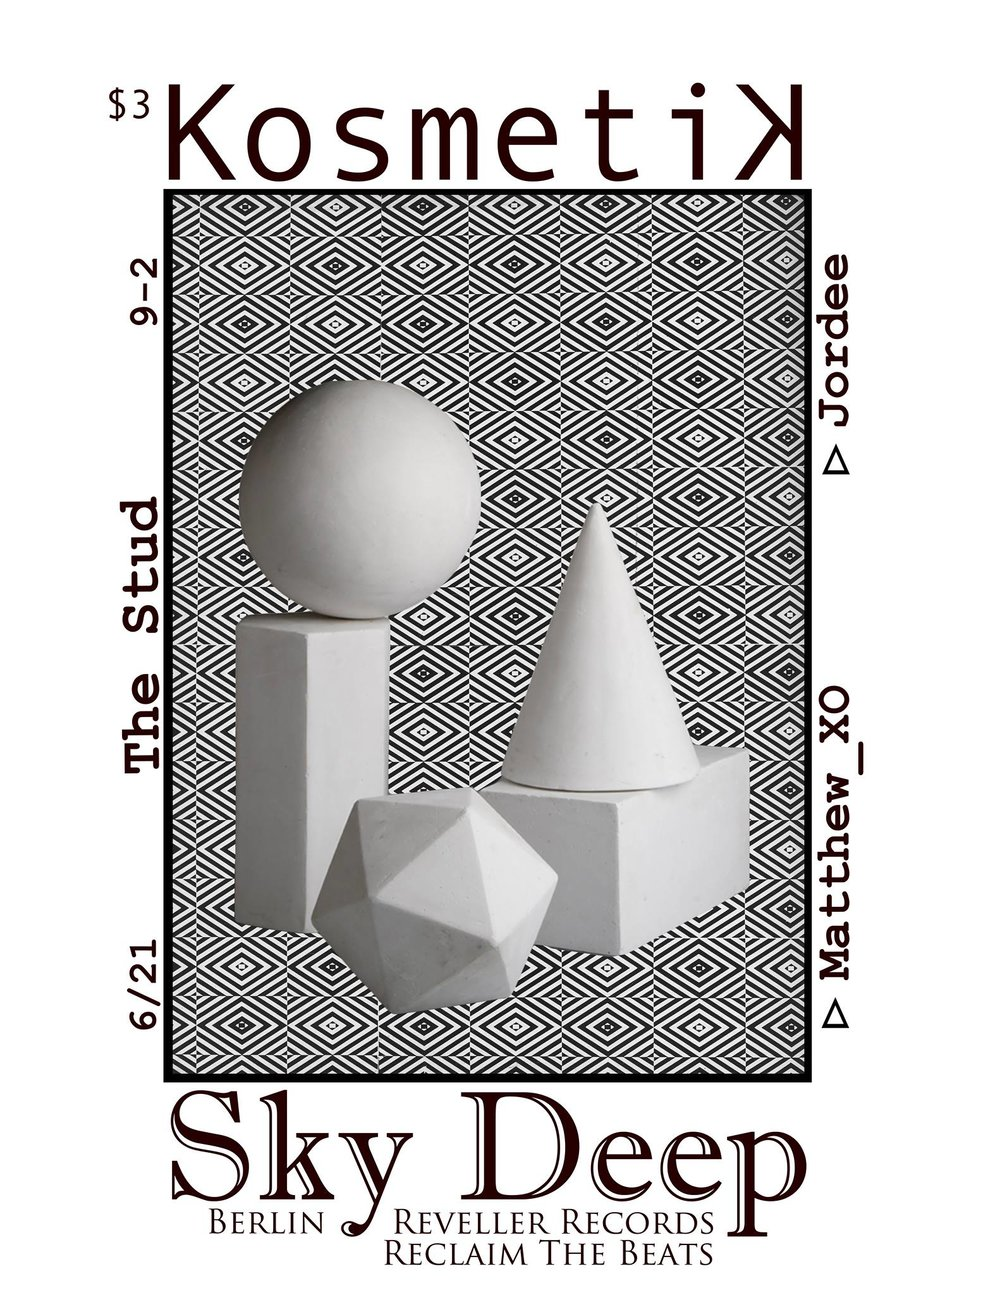 Kosmetik with Sky Deep,Jordee & Matthew XO - The Stud, 6/21